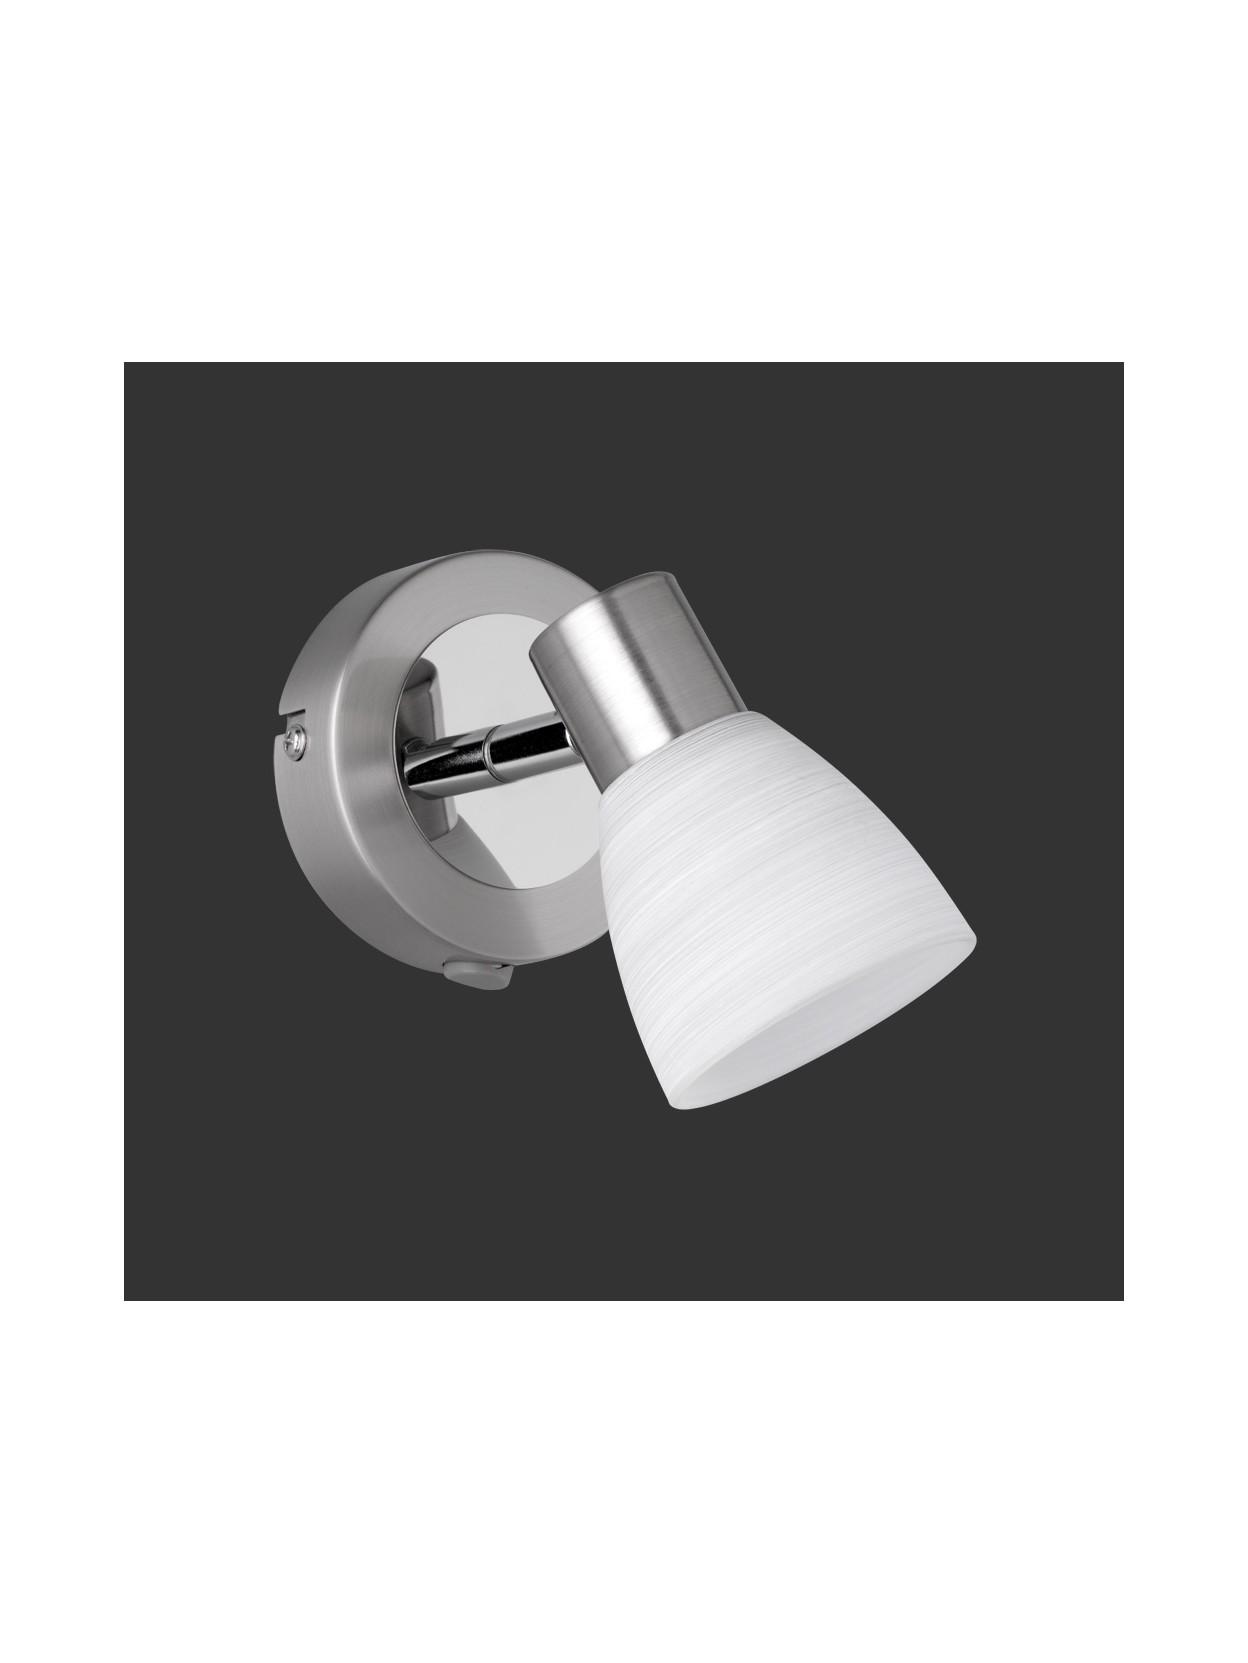 applique spot a led vetro bianco trio 871570107 carico. Black Bedroom Furniture Sets. Home Design Ideas